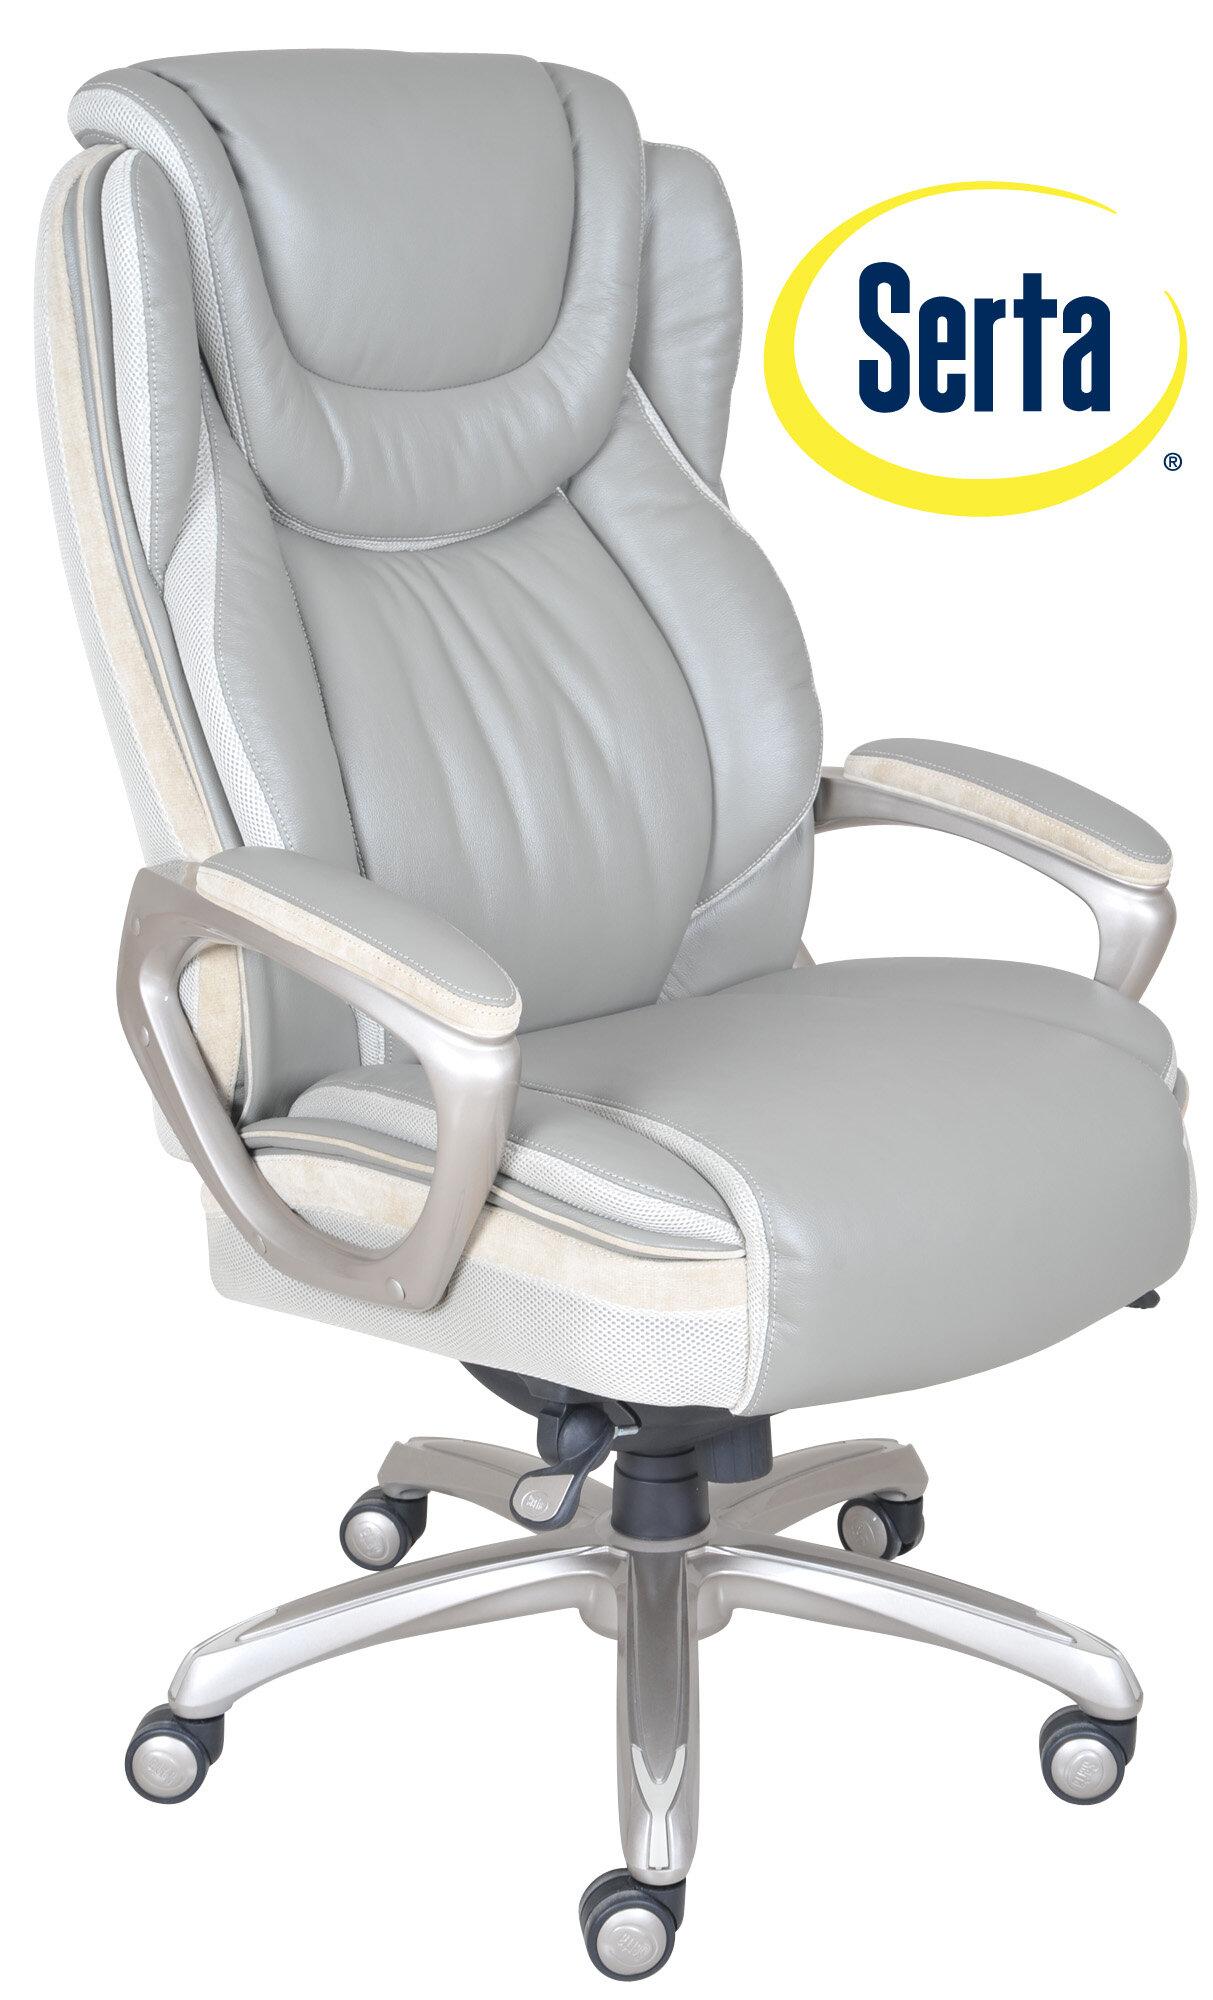 Serenity High Back Executive Office Chair EBay